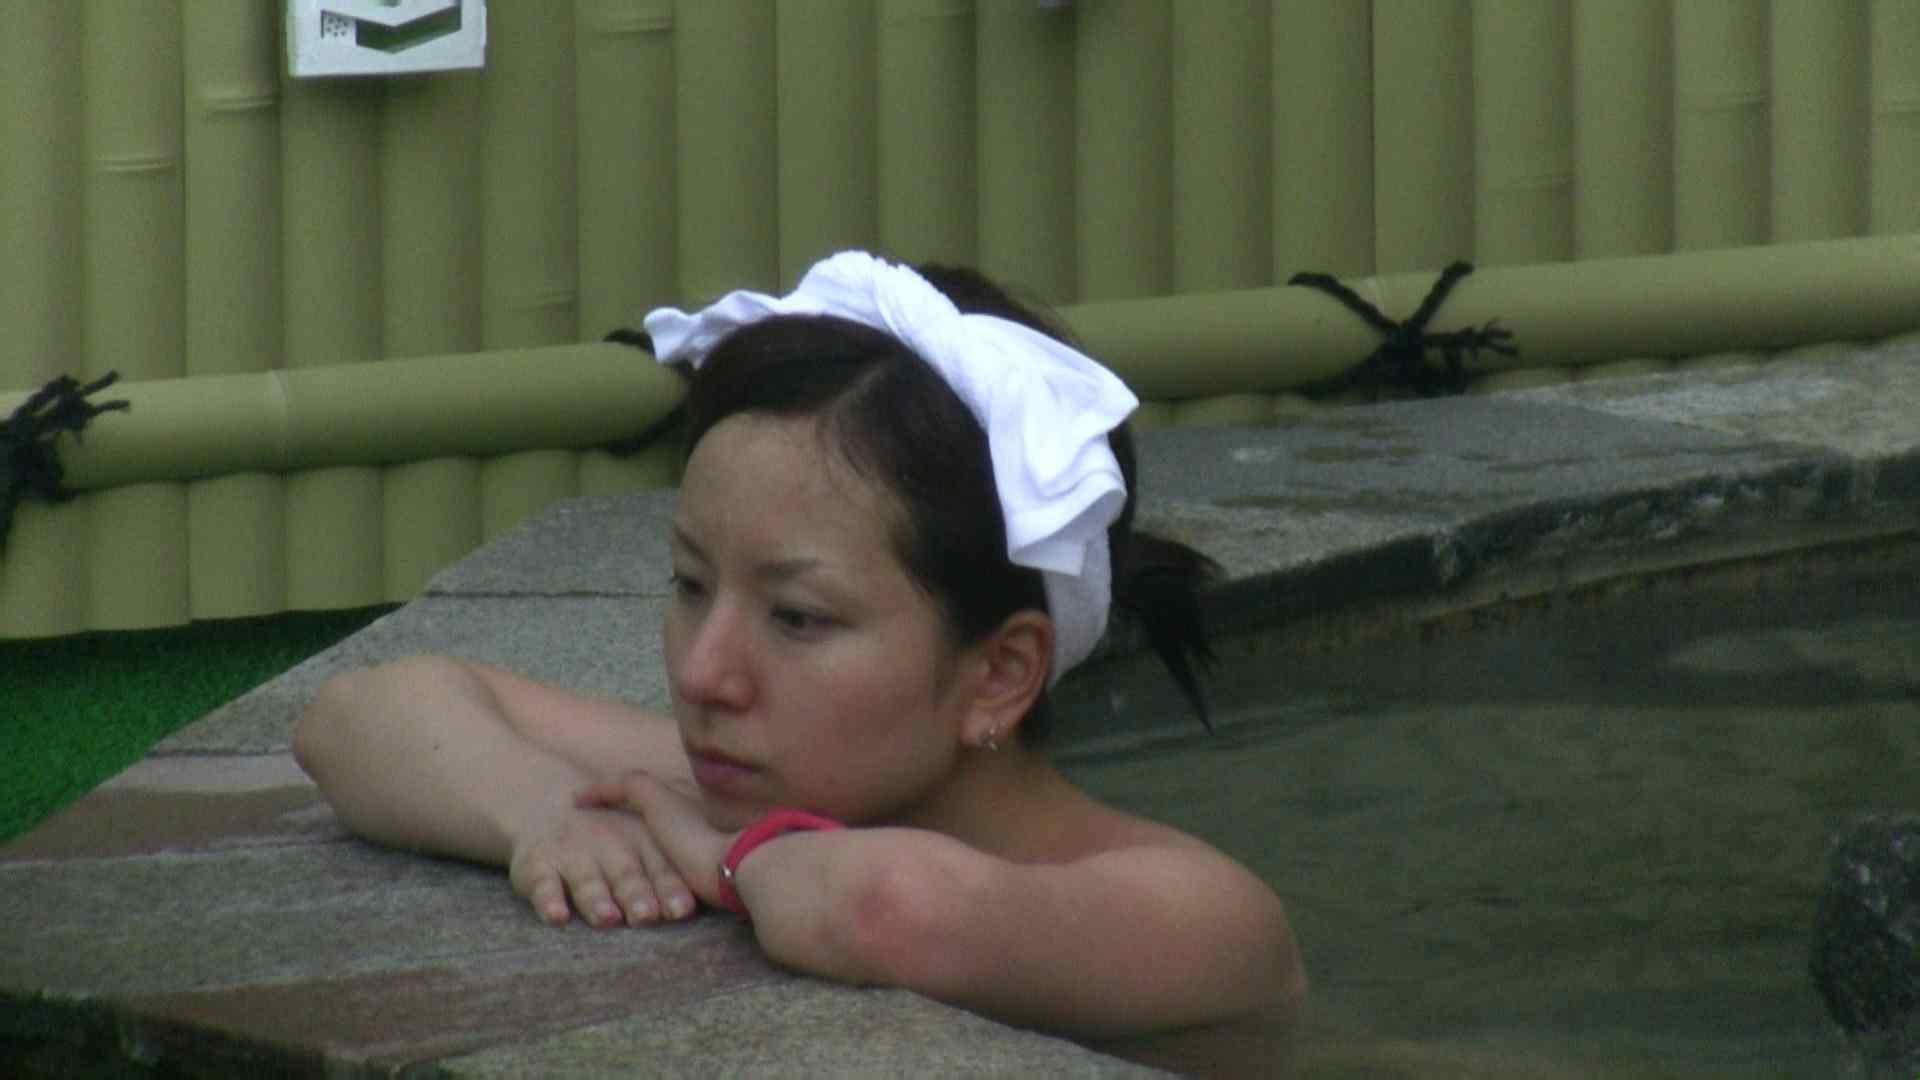 Aquaな露天風呂Vol.39【VIP】 盗撮シリーズ   露天風呂編  85PIX 49